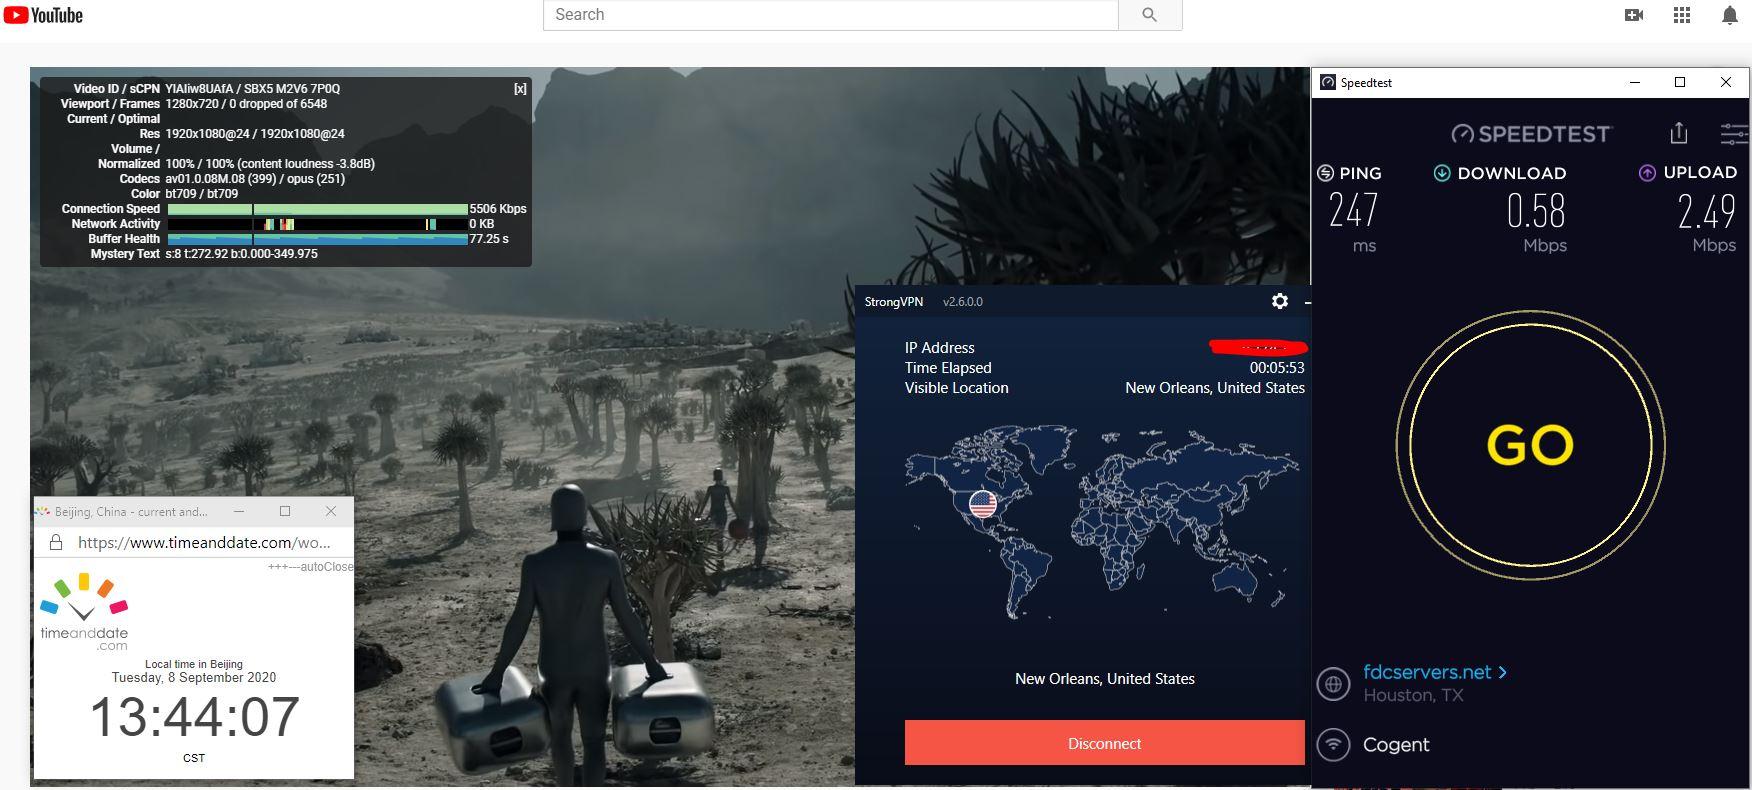 Windows10 StrongVPN USA - New Orleans 中国VPN 翻墙 科学上网 翻墙速度测试 - 20200908